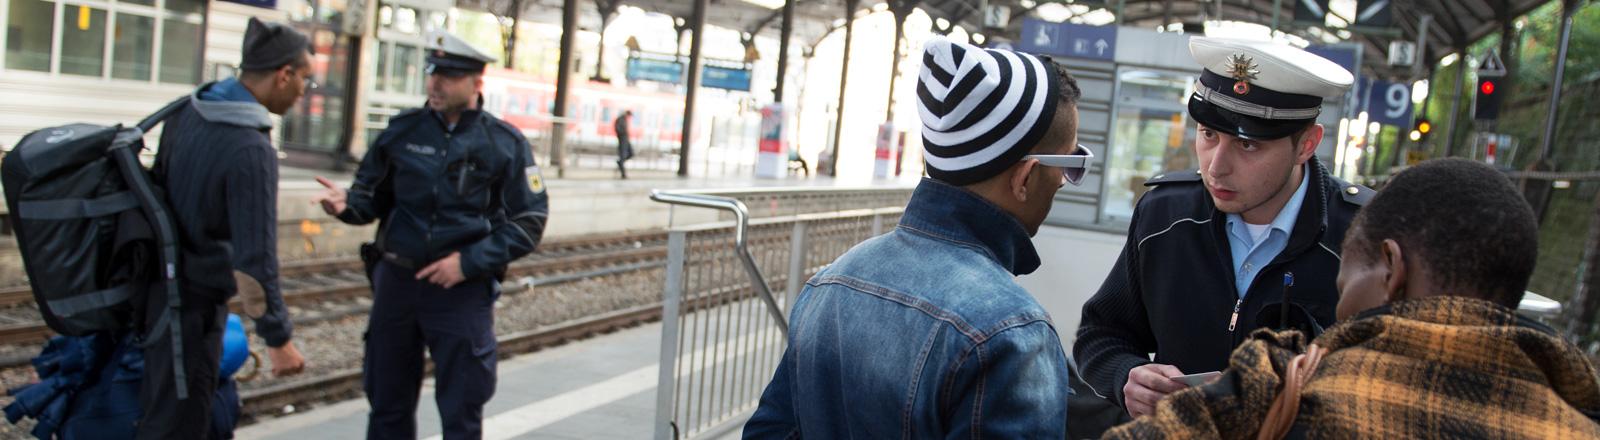 Zwei Bundespolizisten kontrollieren am Hauptbahnhof Aachen; Bild: dpa